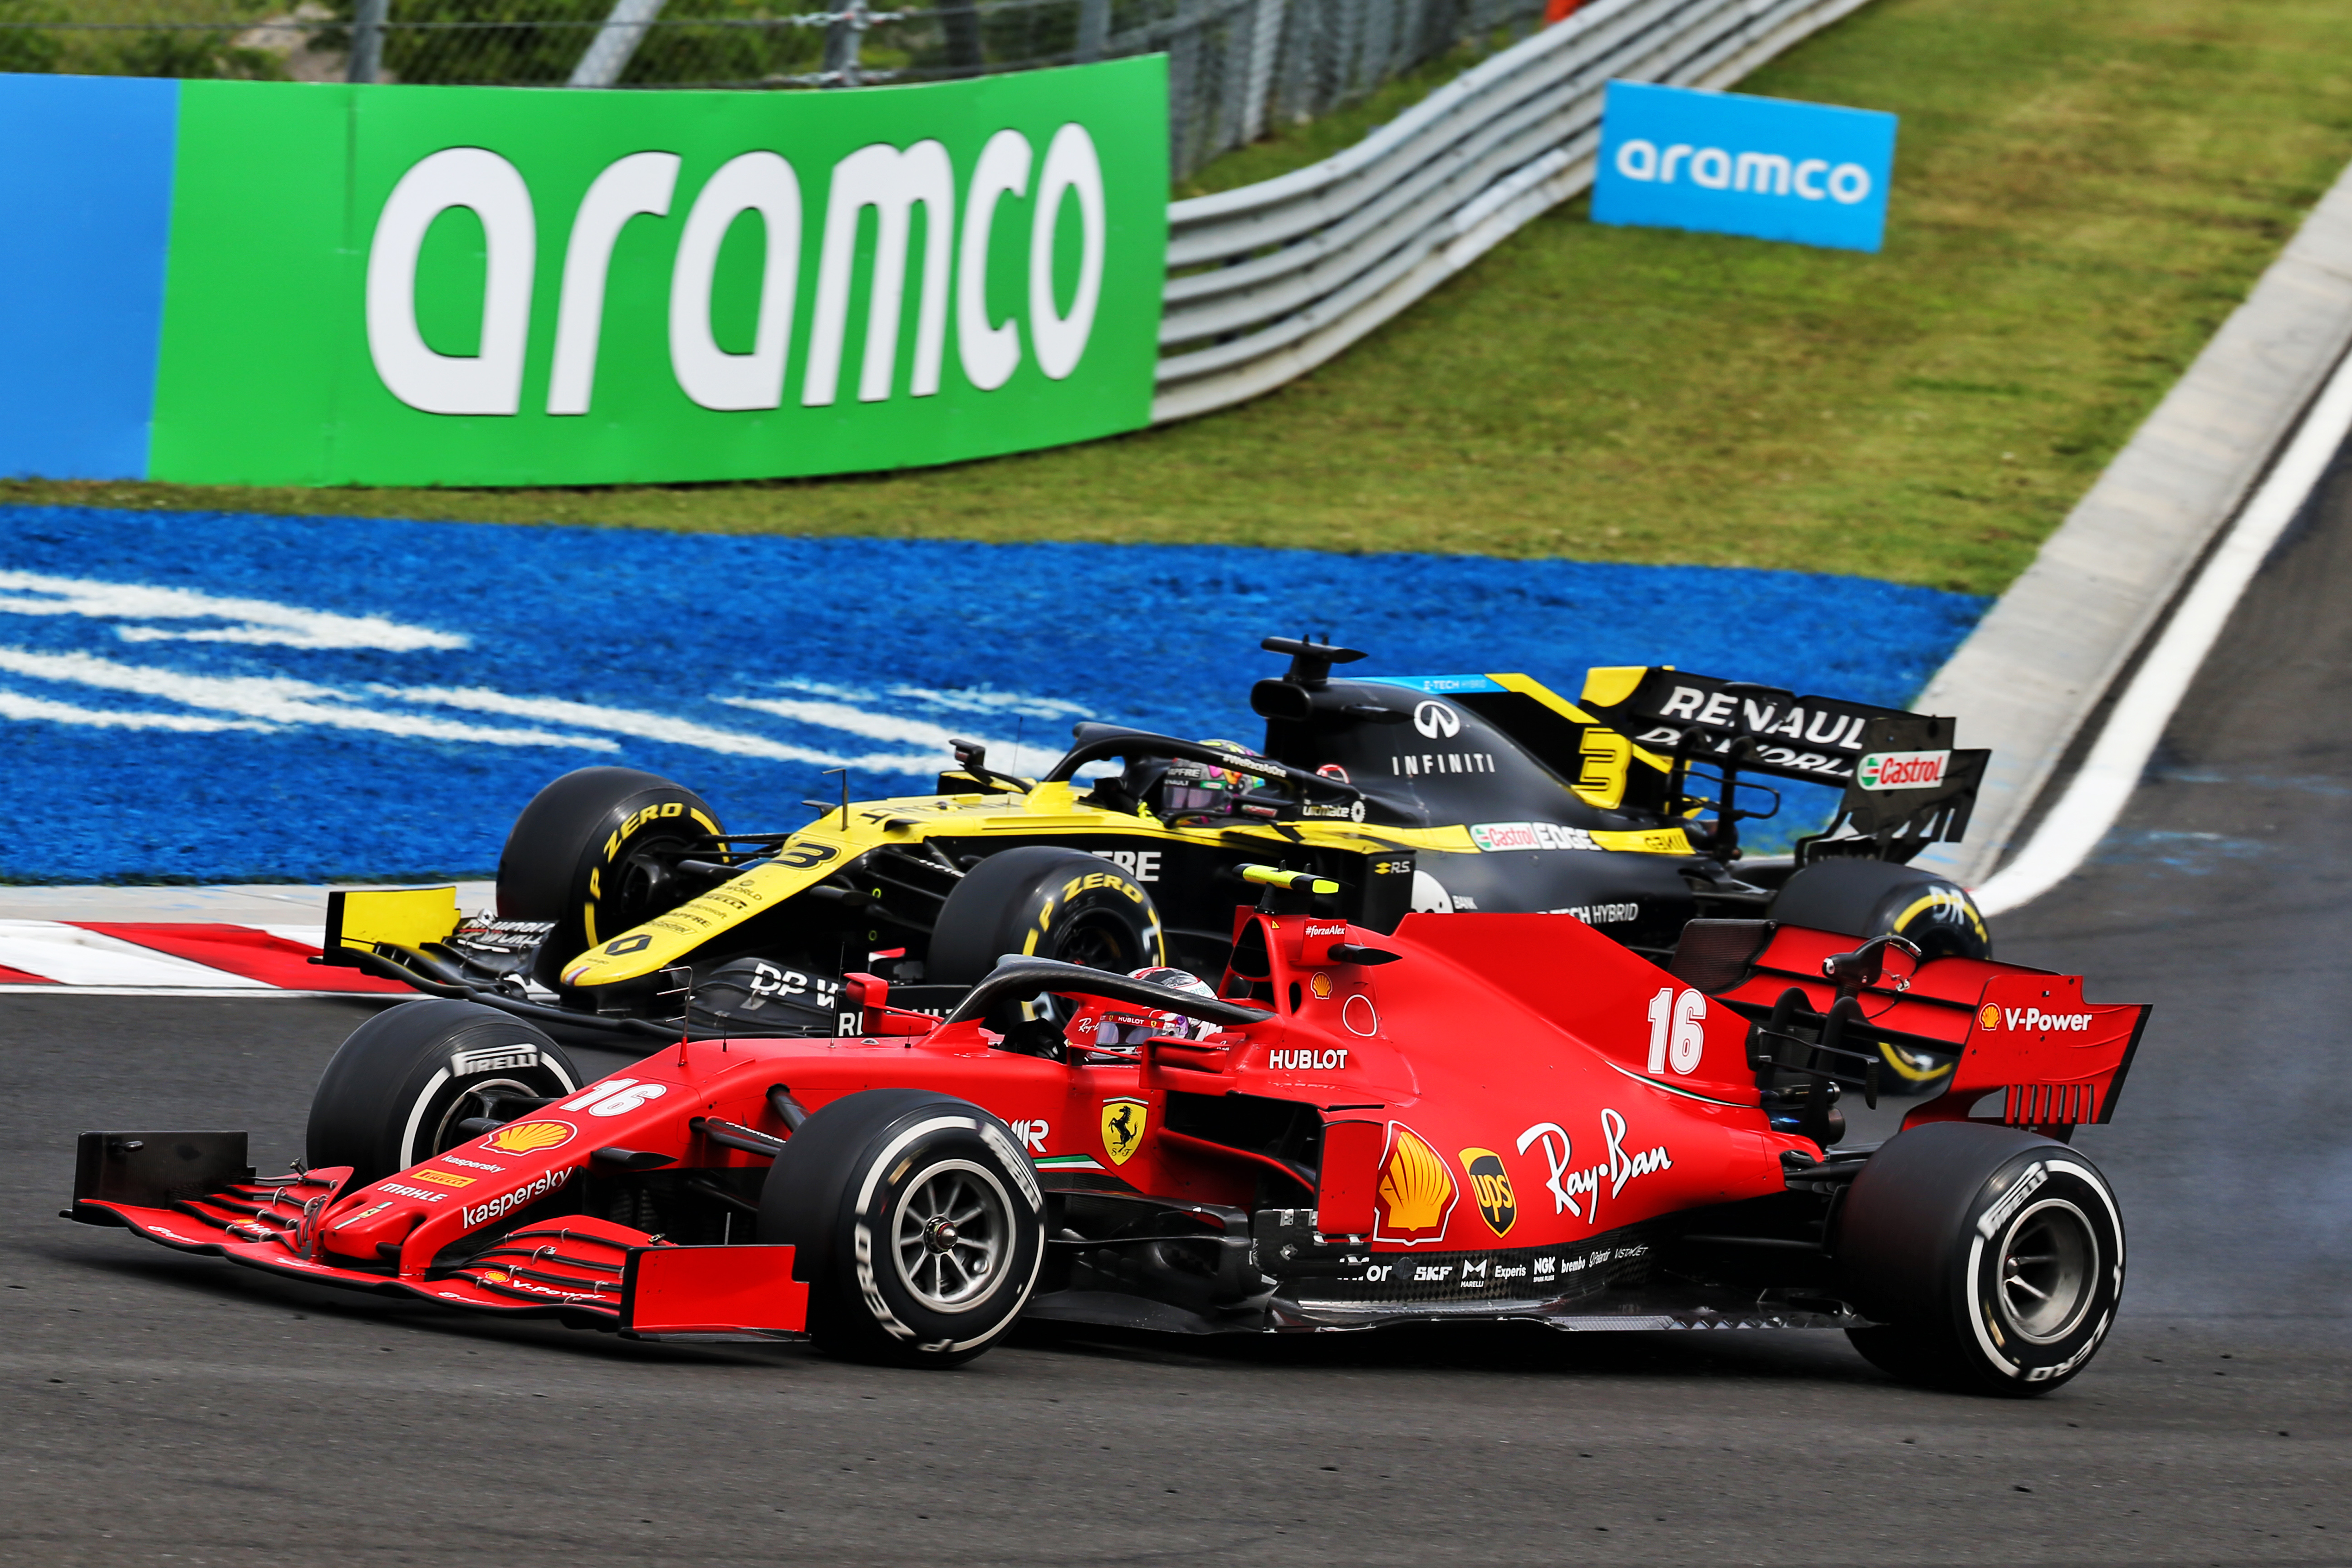 Daniel Ricciardo Renault Sebastian Vettel Ferrari Hungarian Grand Prix 2020